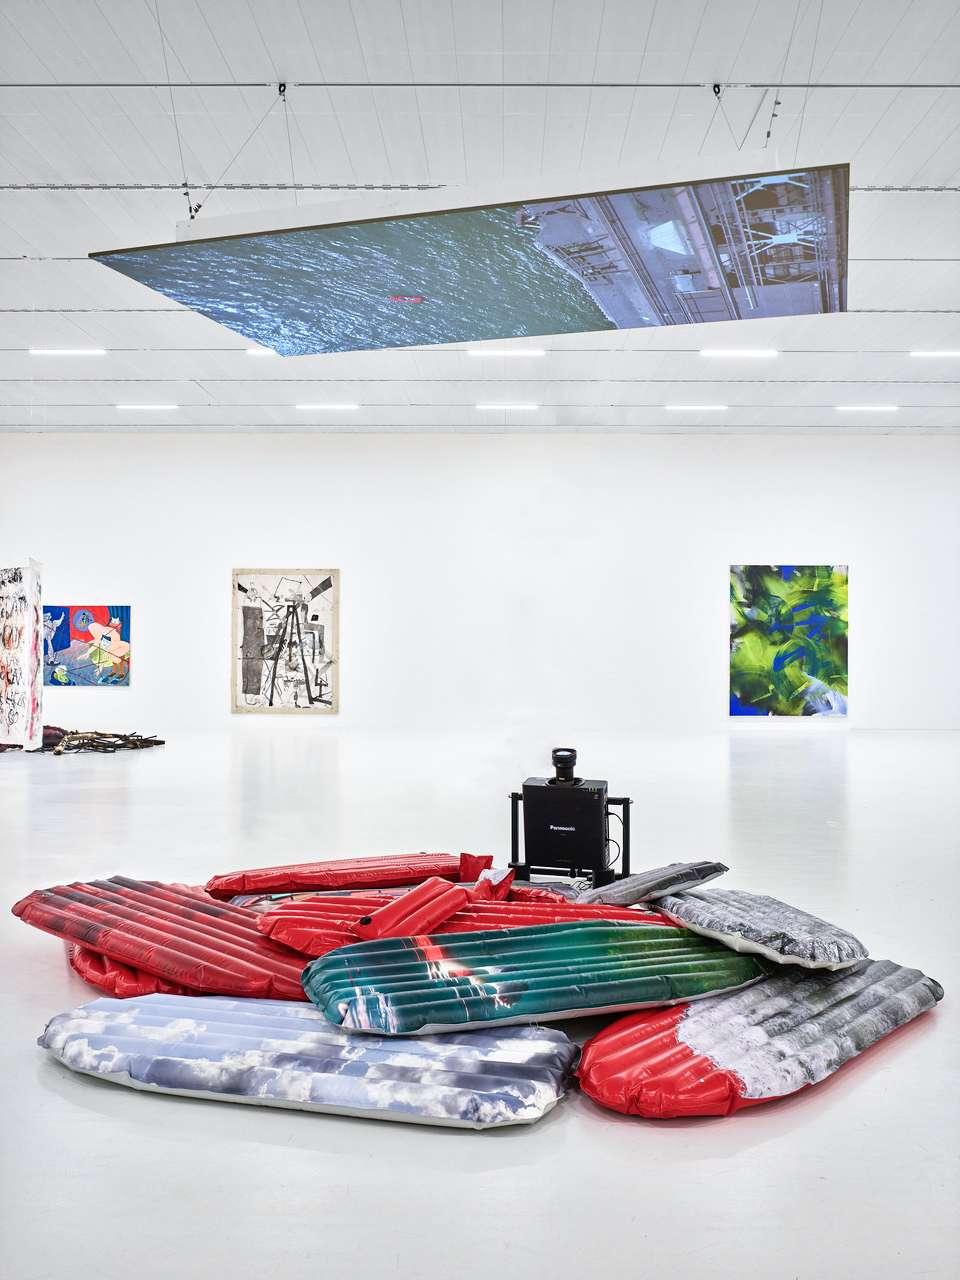 Medusa : floating body #3, exhibition view at K21, 2020, photo: Katja Illner